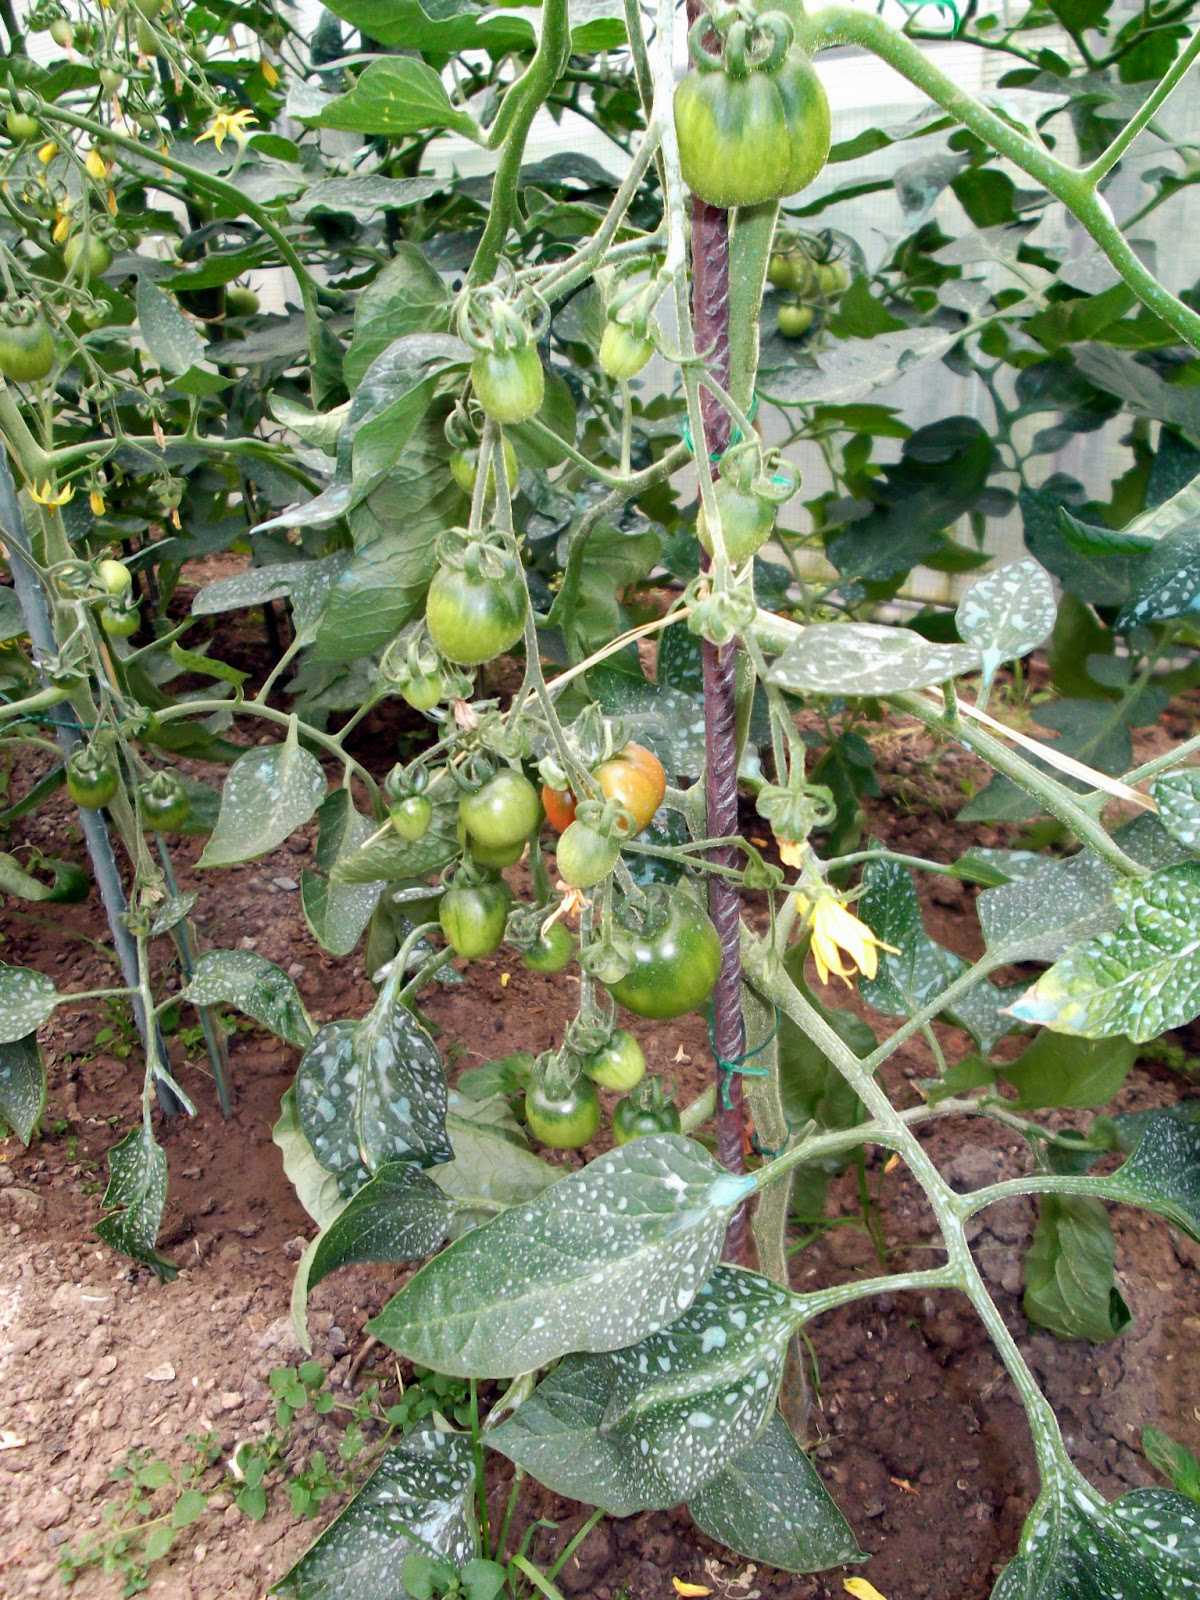 Passion tomates premi res tomates for Bouillie bordelaise piscine